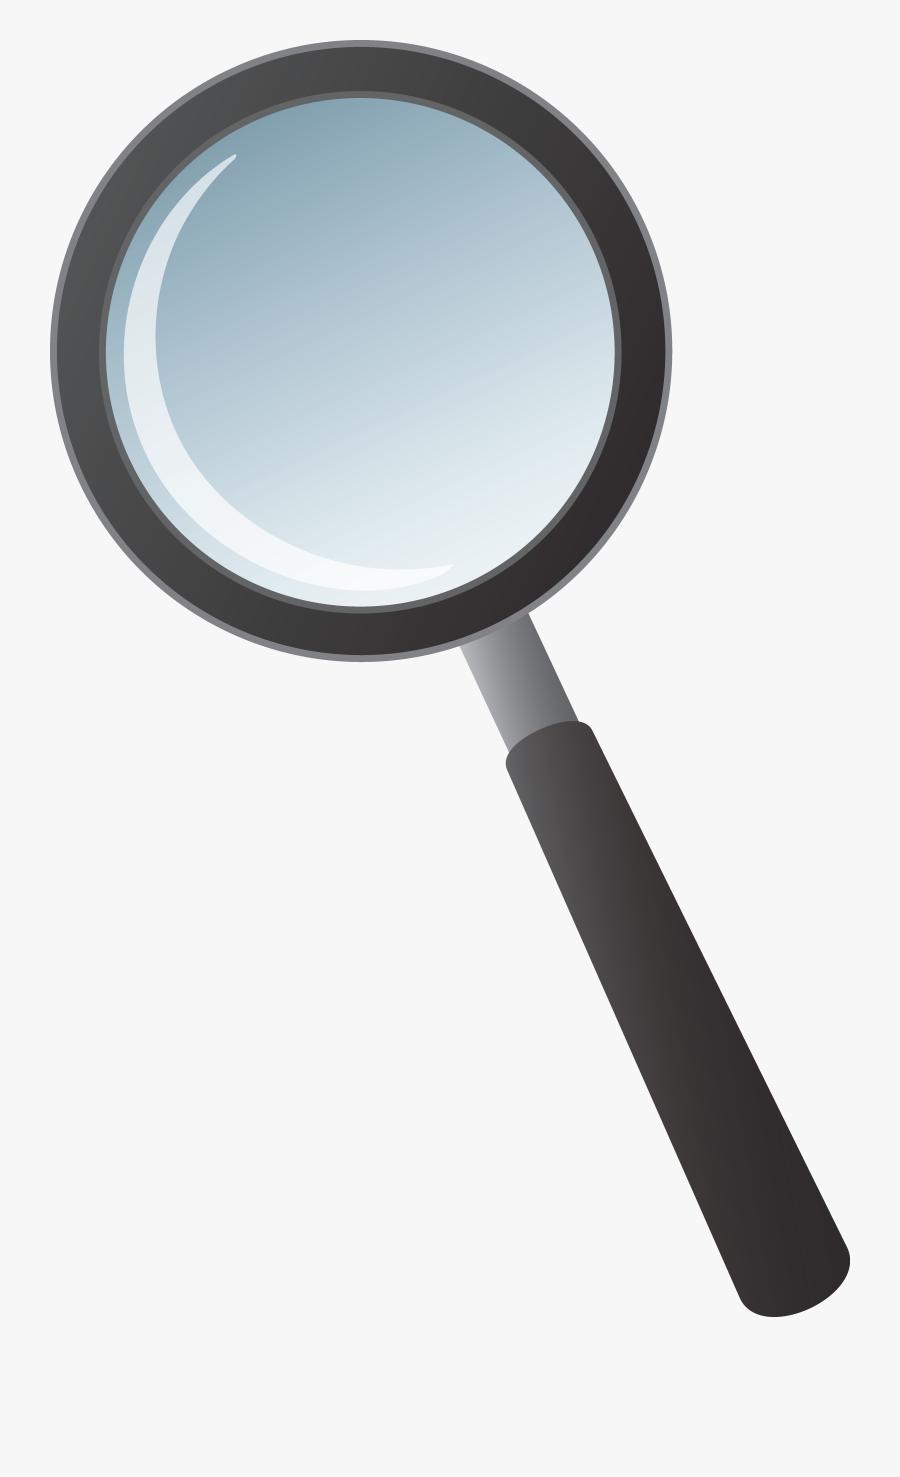 Clip Art Magnifying Glass, Transparent Clipart